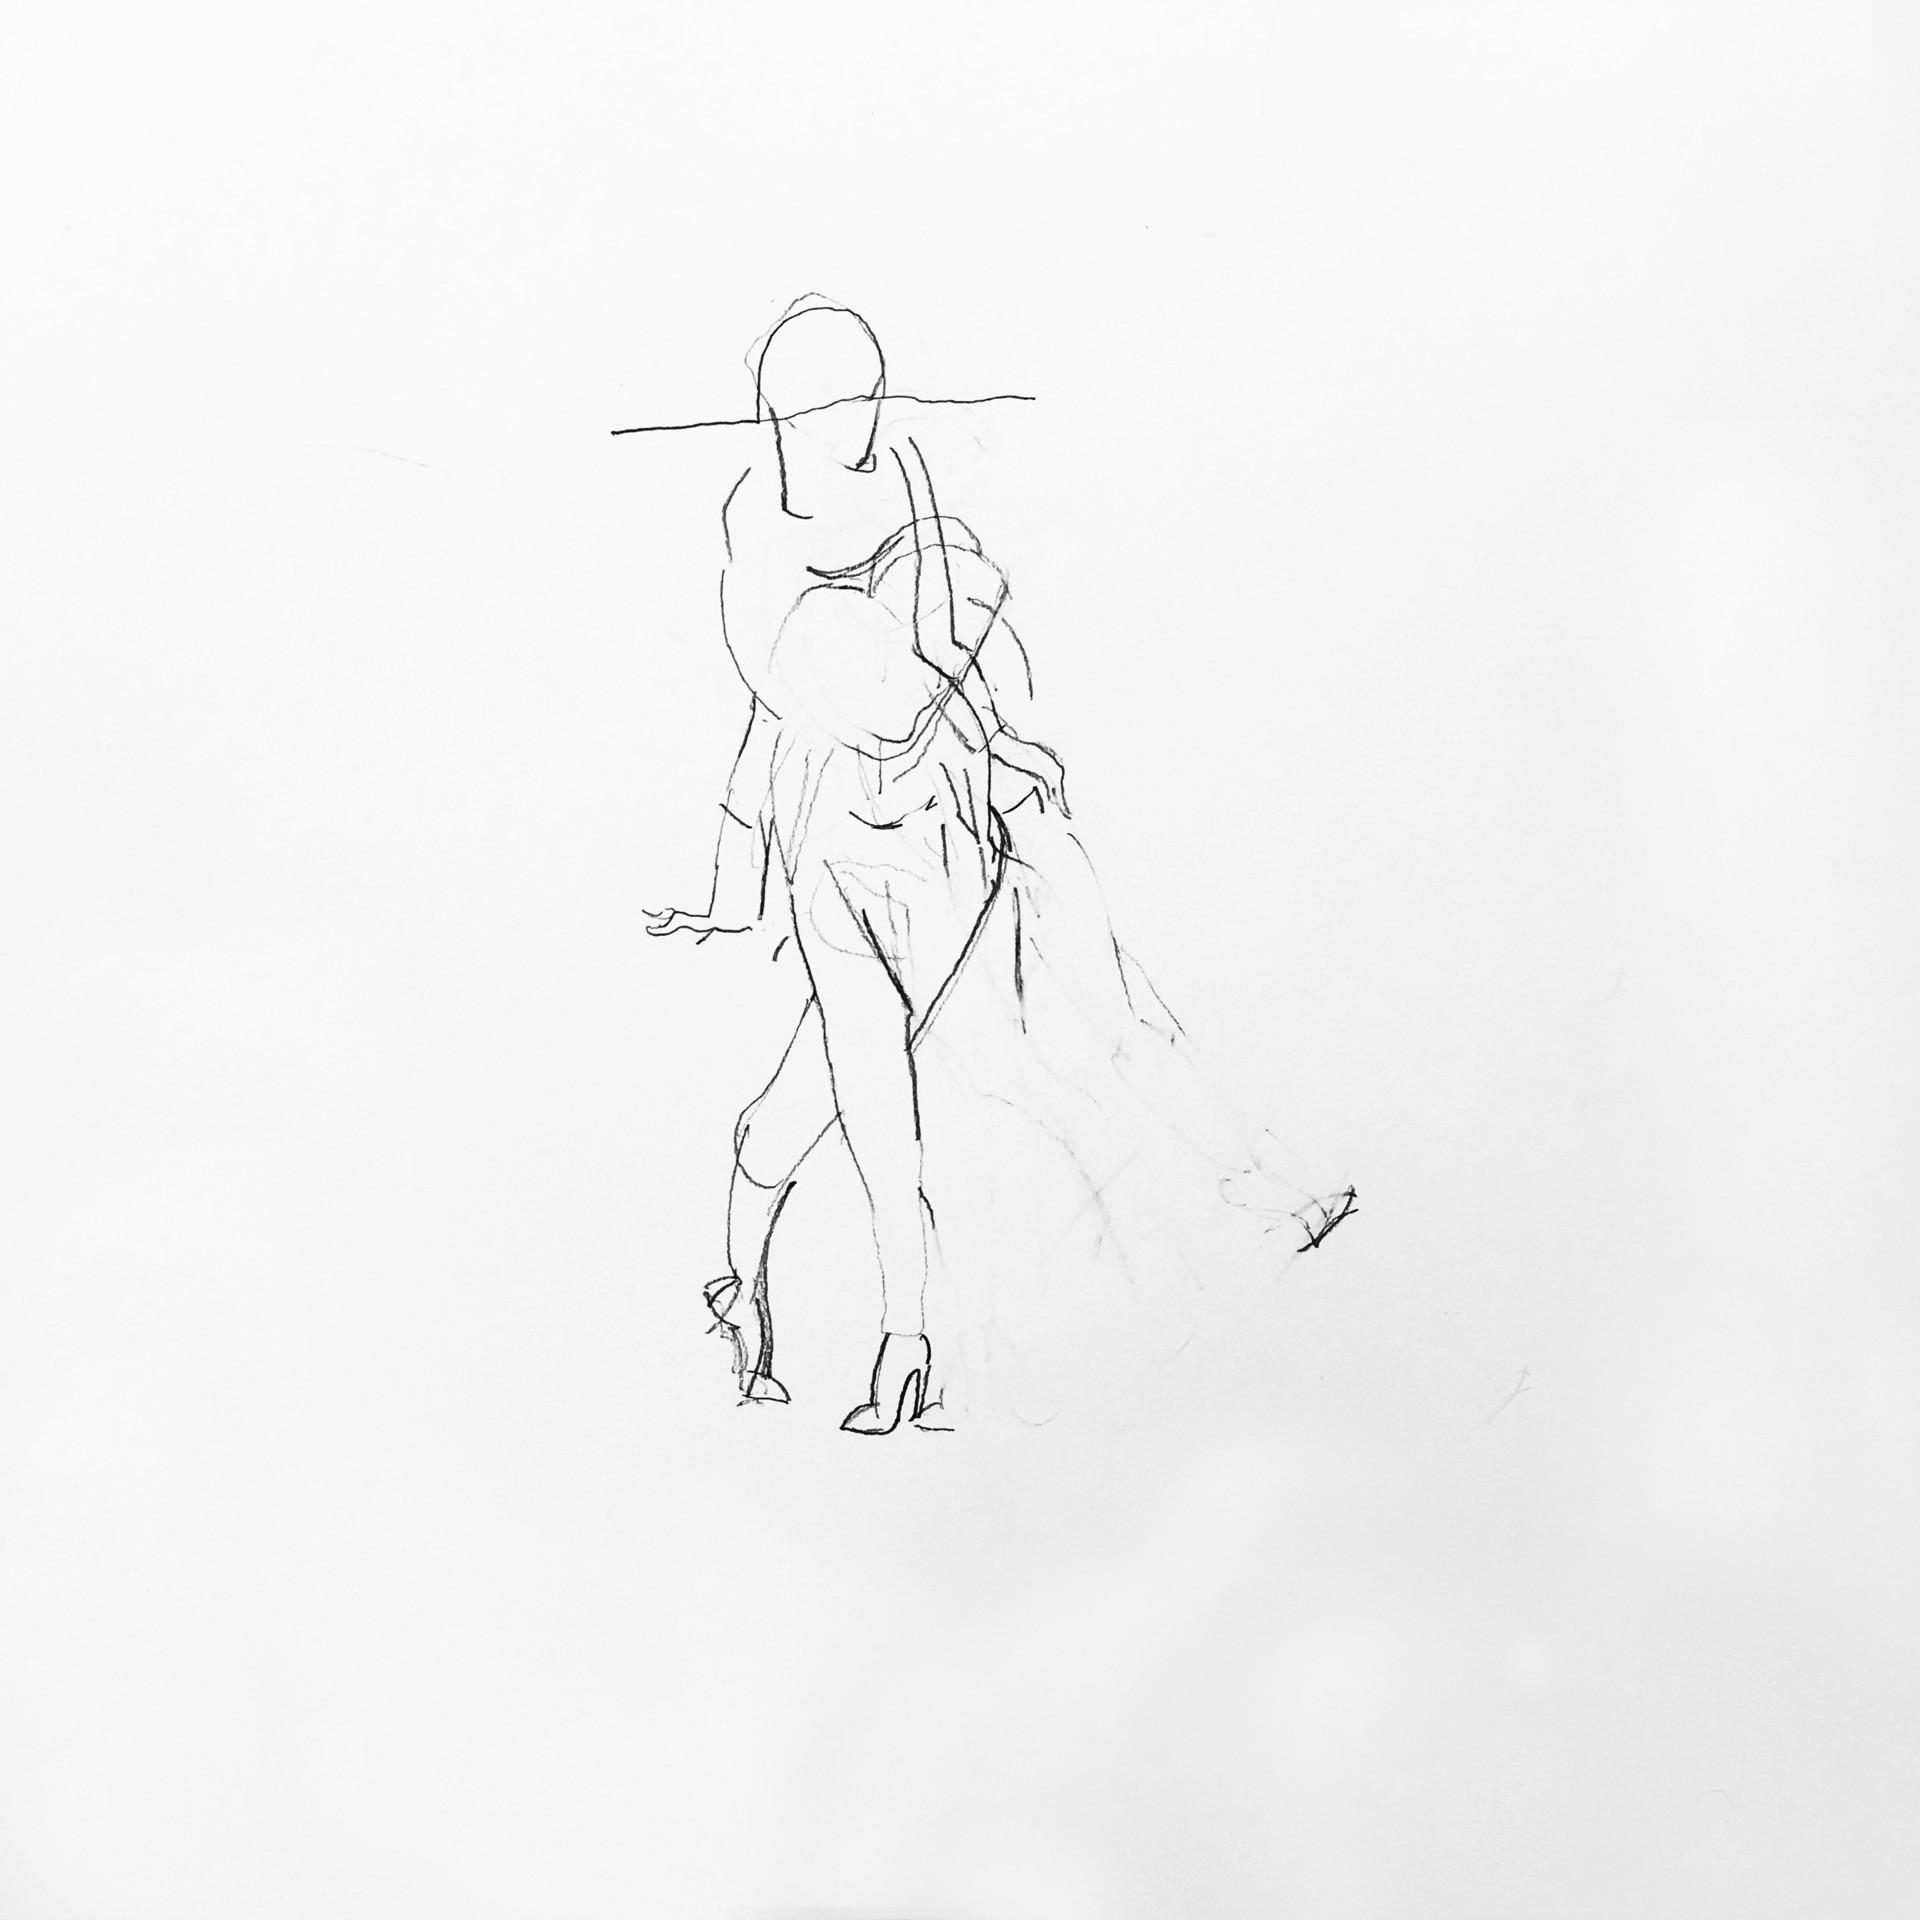 Nathan clark draw10